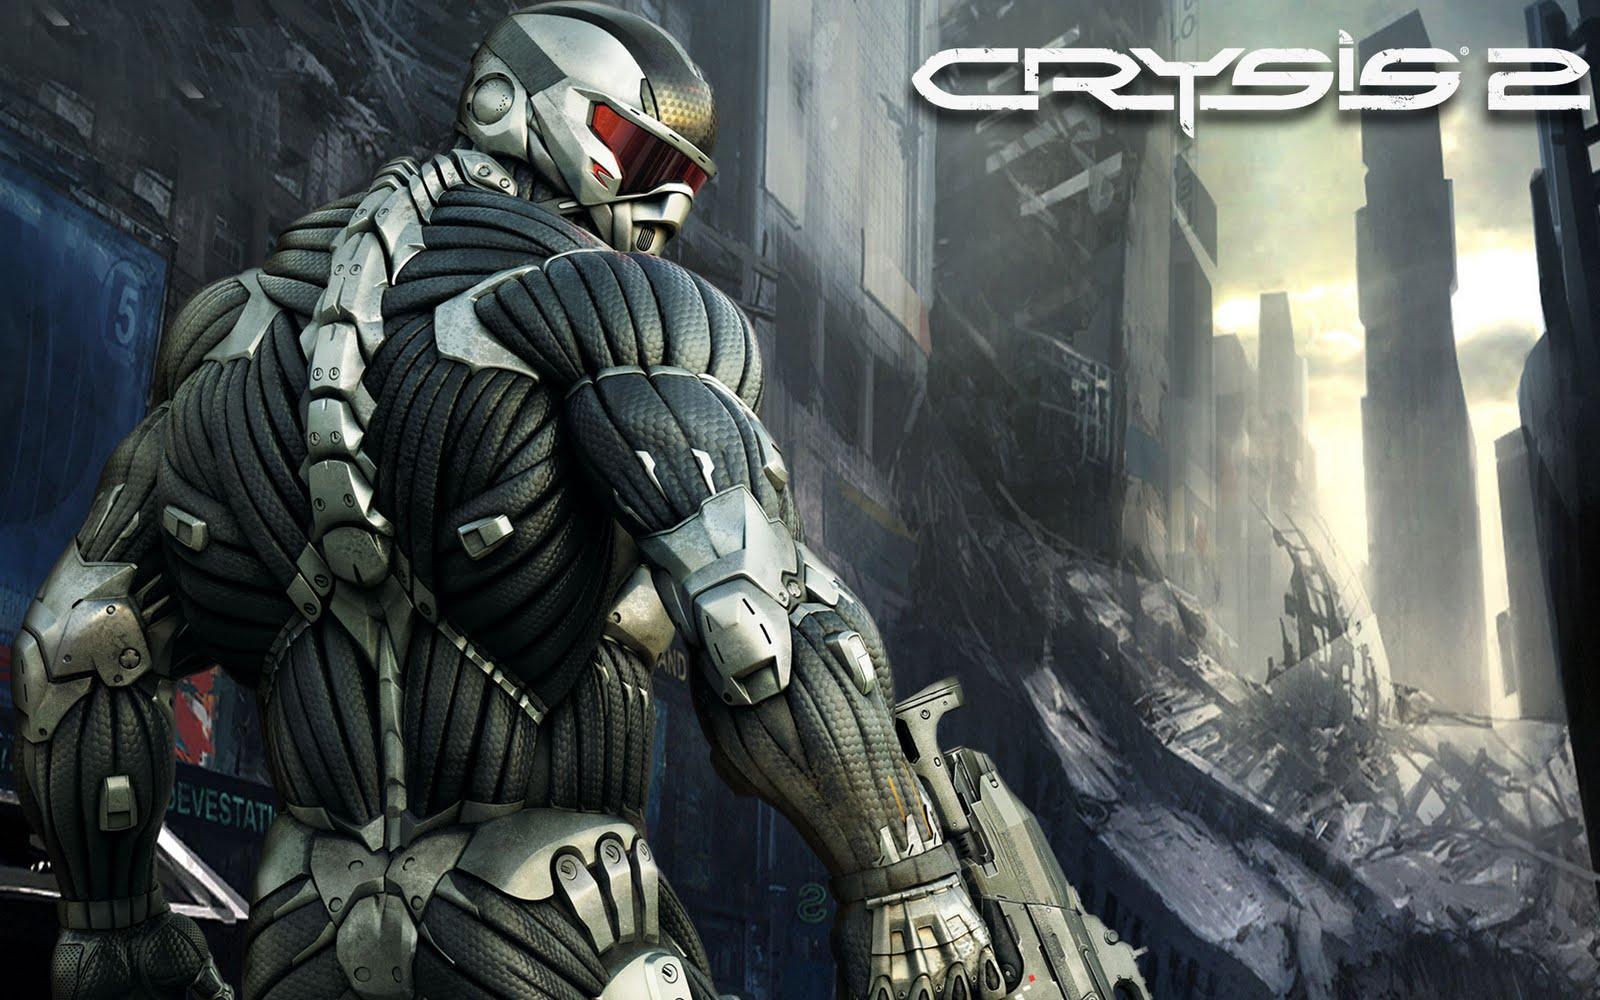 http://4.bp.blogspot.com/-yC2j8Q-Ex7I/Ti5WVxogx9I/AAAAAAAAAVE/RU6C5zyzjkg/s1600/2011_crysis_2_game-wide.jpg